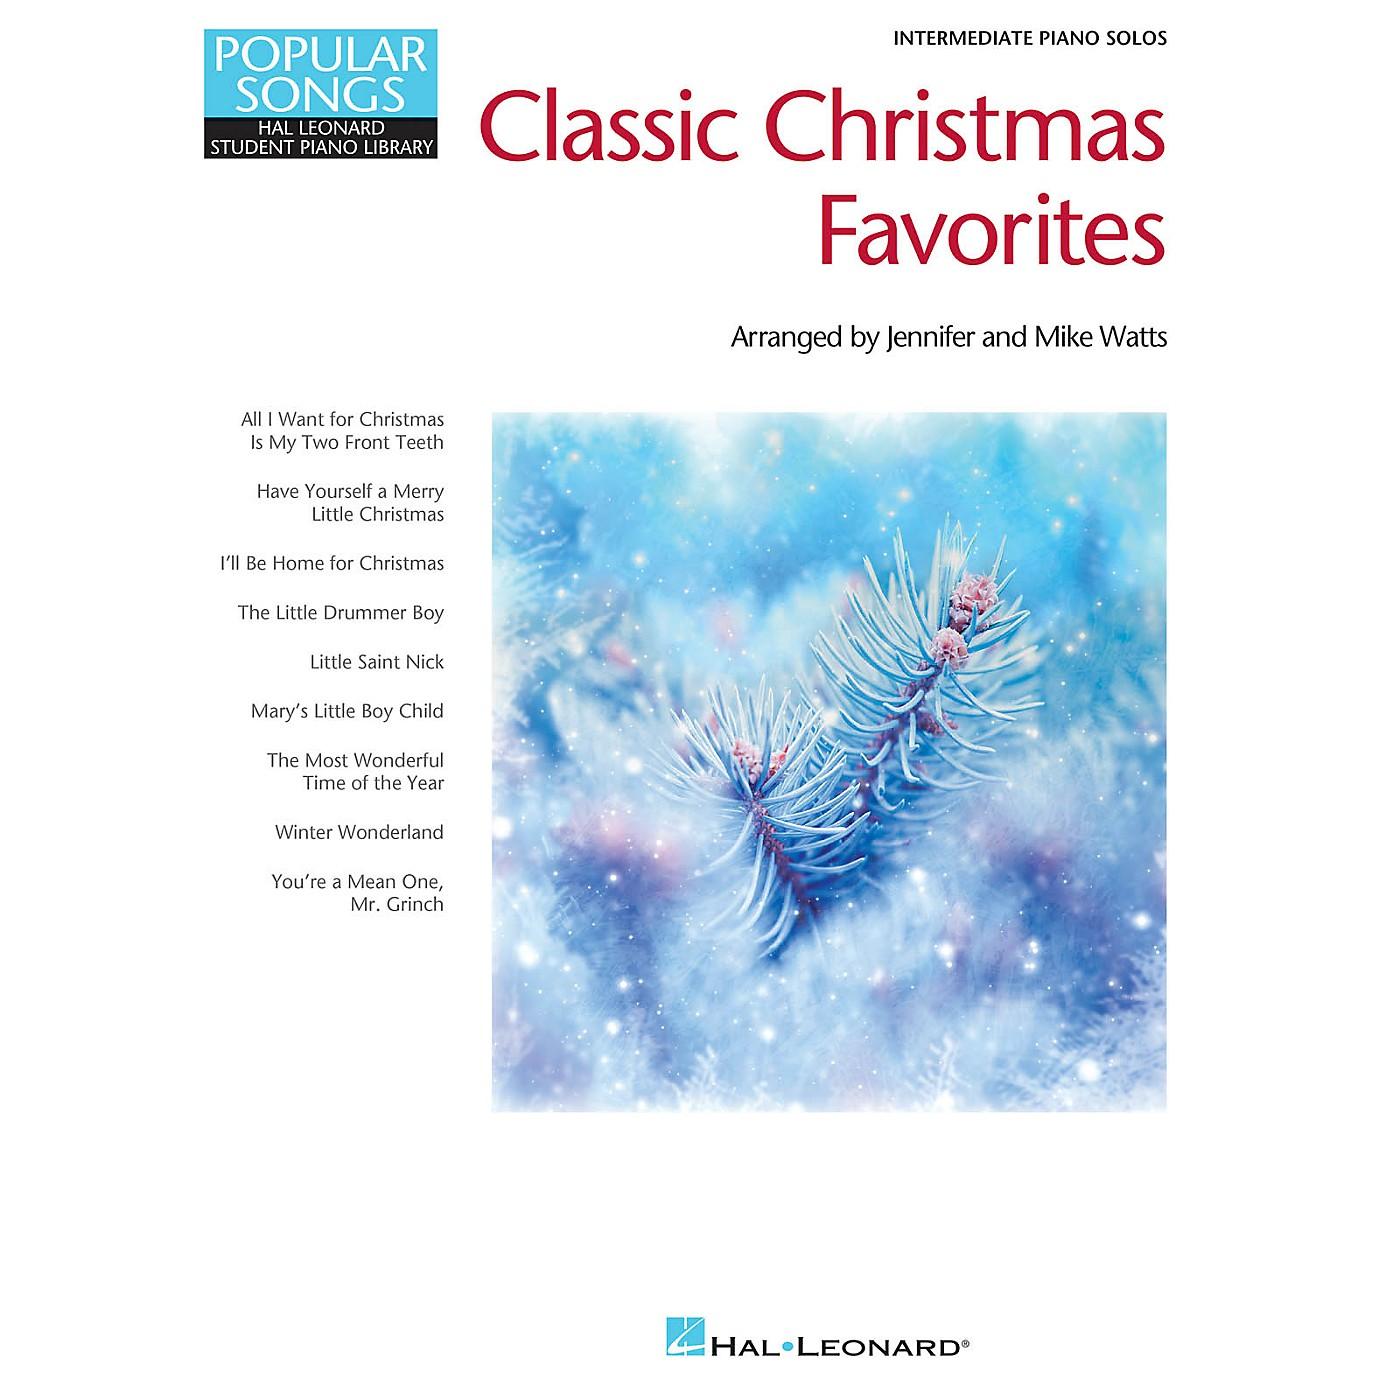 Hal Leonard Classic Christmas Favorites Piano Library Series Book (Level Inter) thumbnail